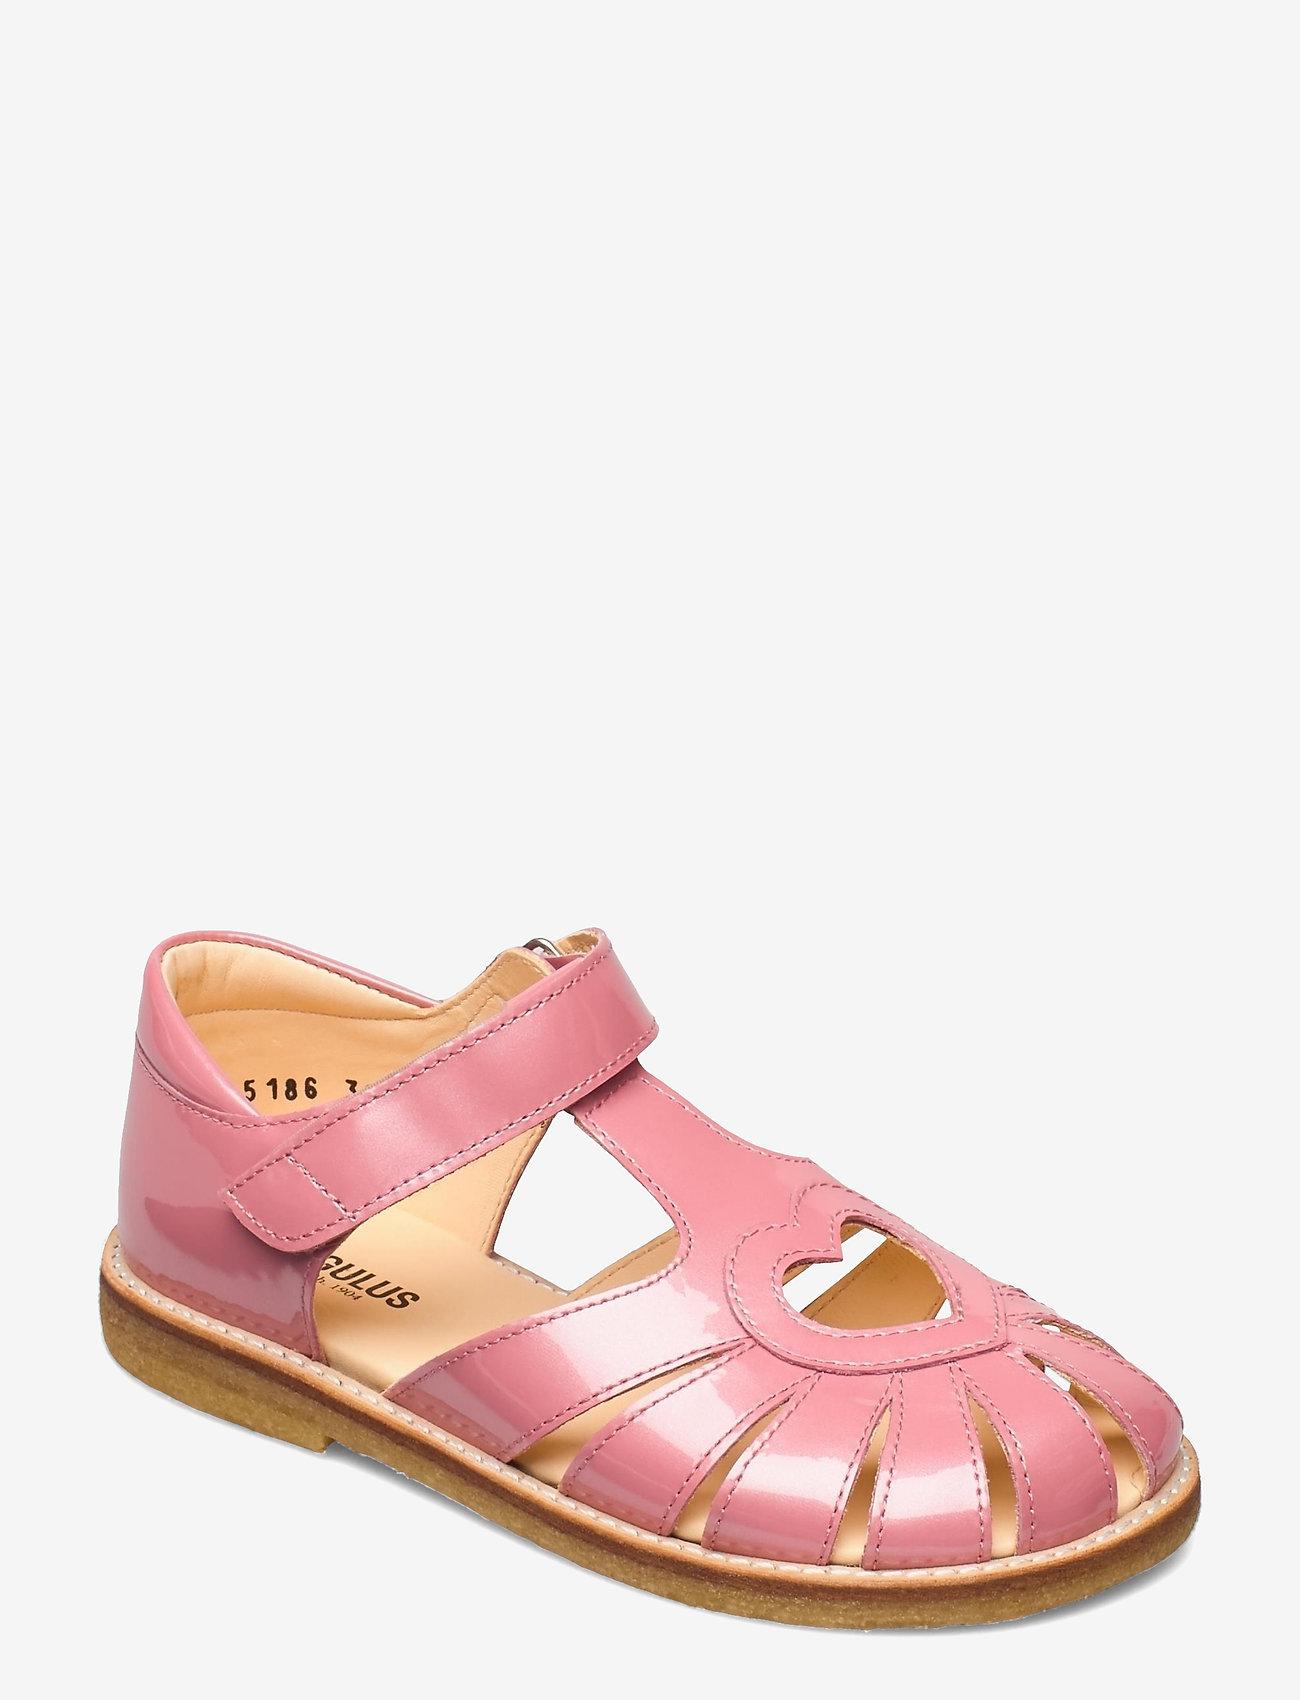 ANGULUS - Sandals - flat - closed toe -  - strap sandals - 2389 rose pink - 0